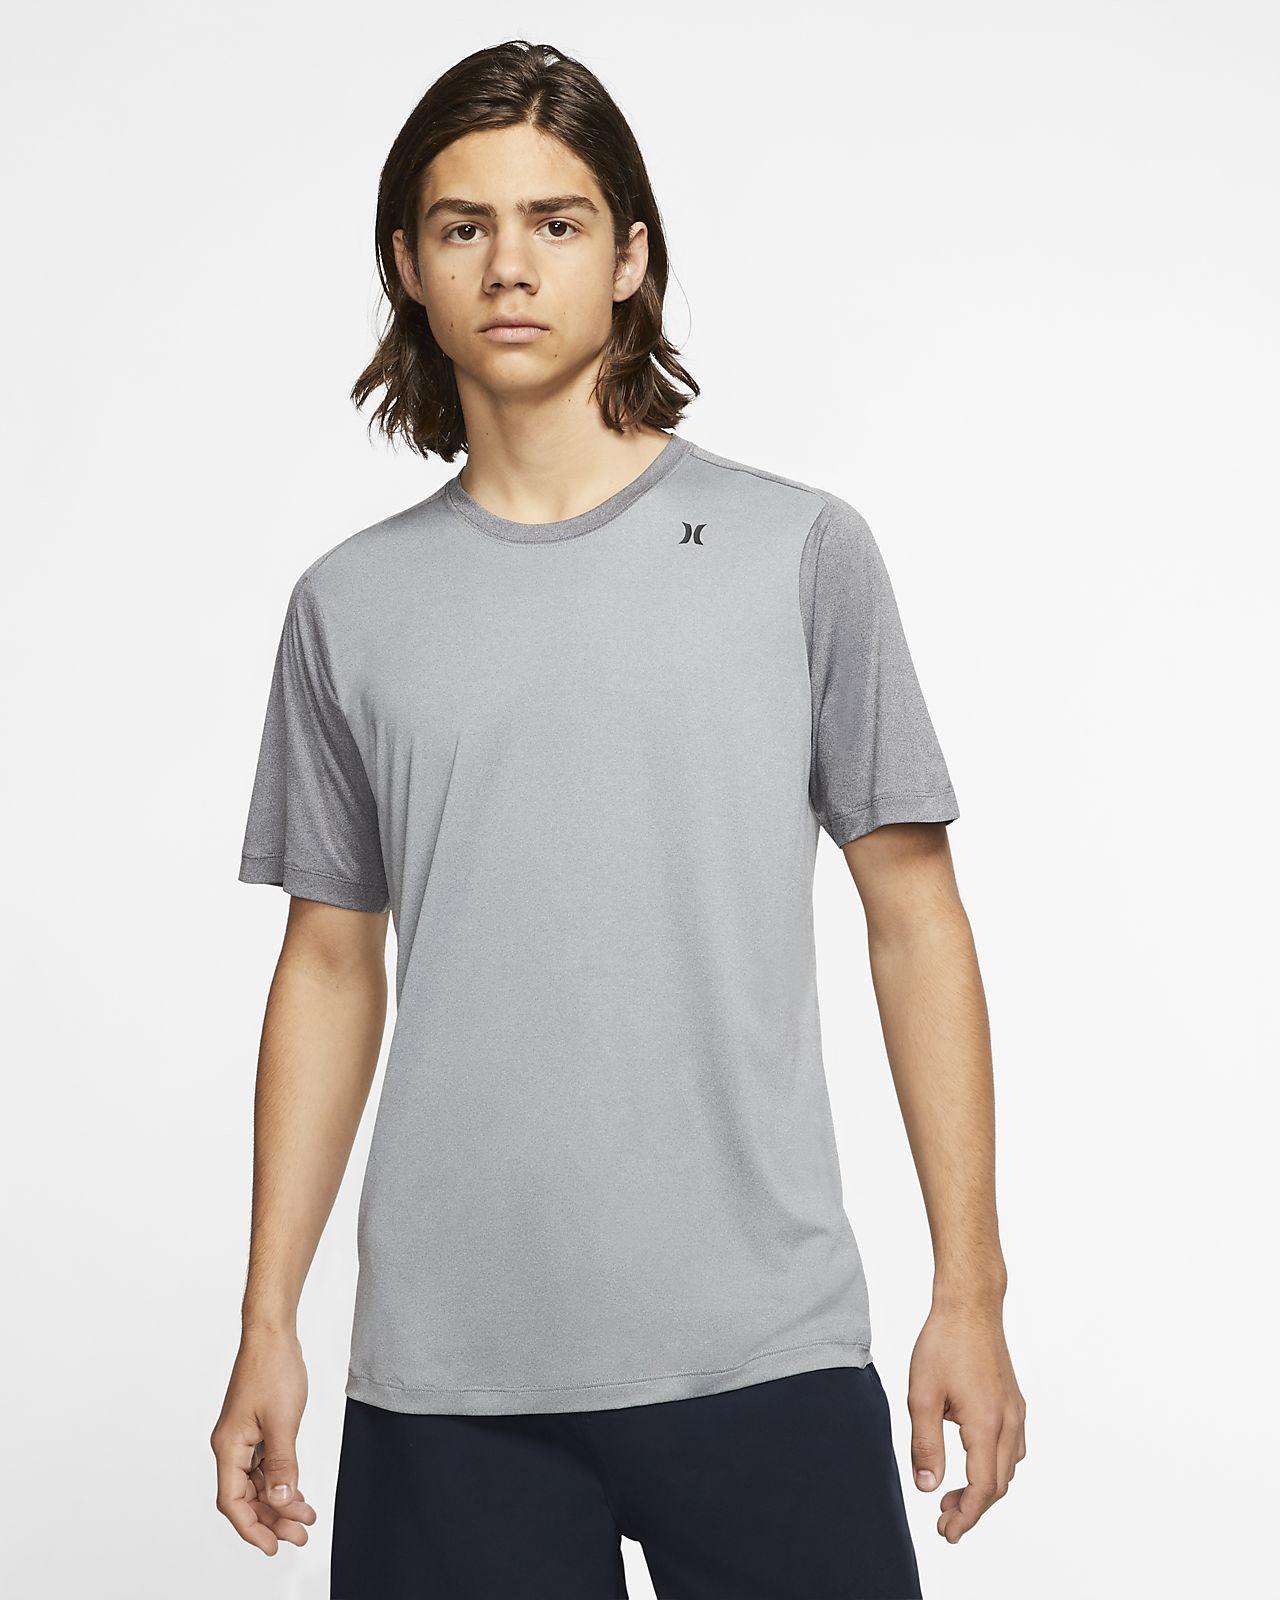 Hurley Quick Dry Nu Basics Men's Short-Sleeve Top